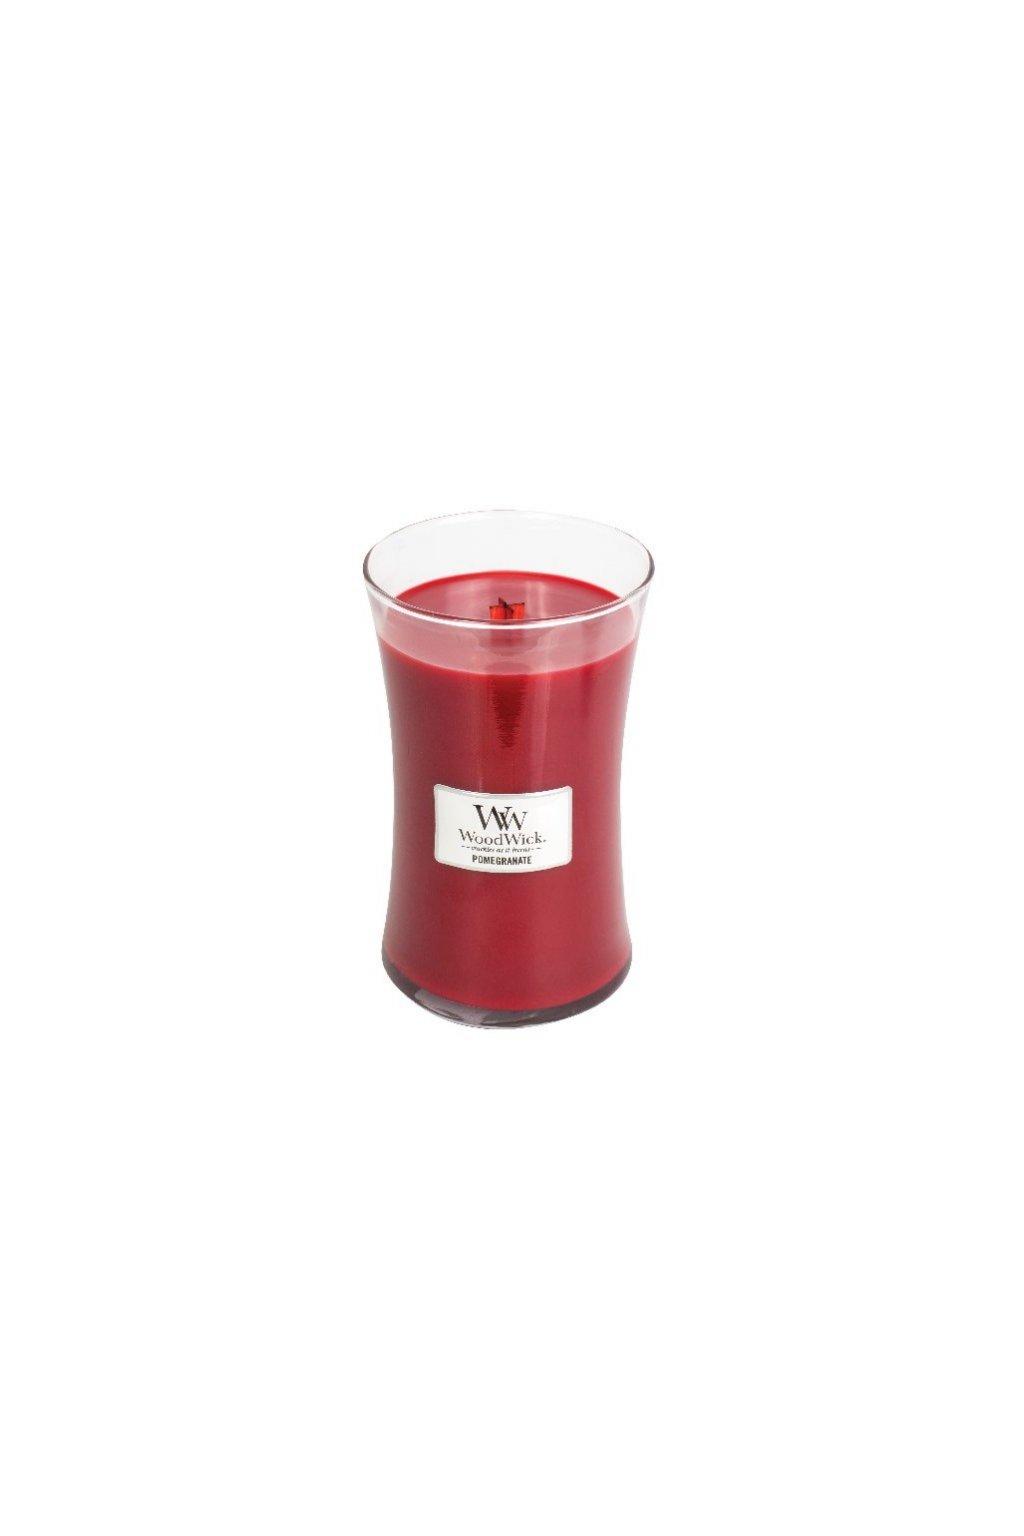 woodwick vonna svicka velka vaza pomegranate 609 g 1